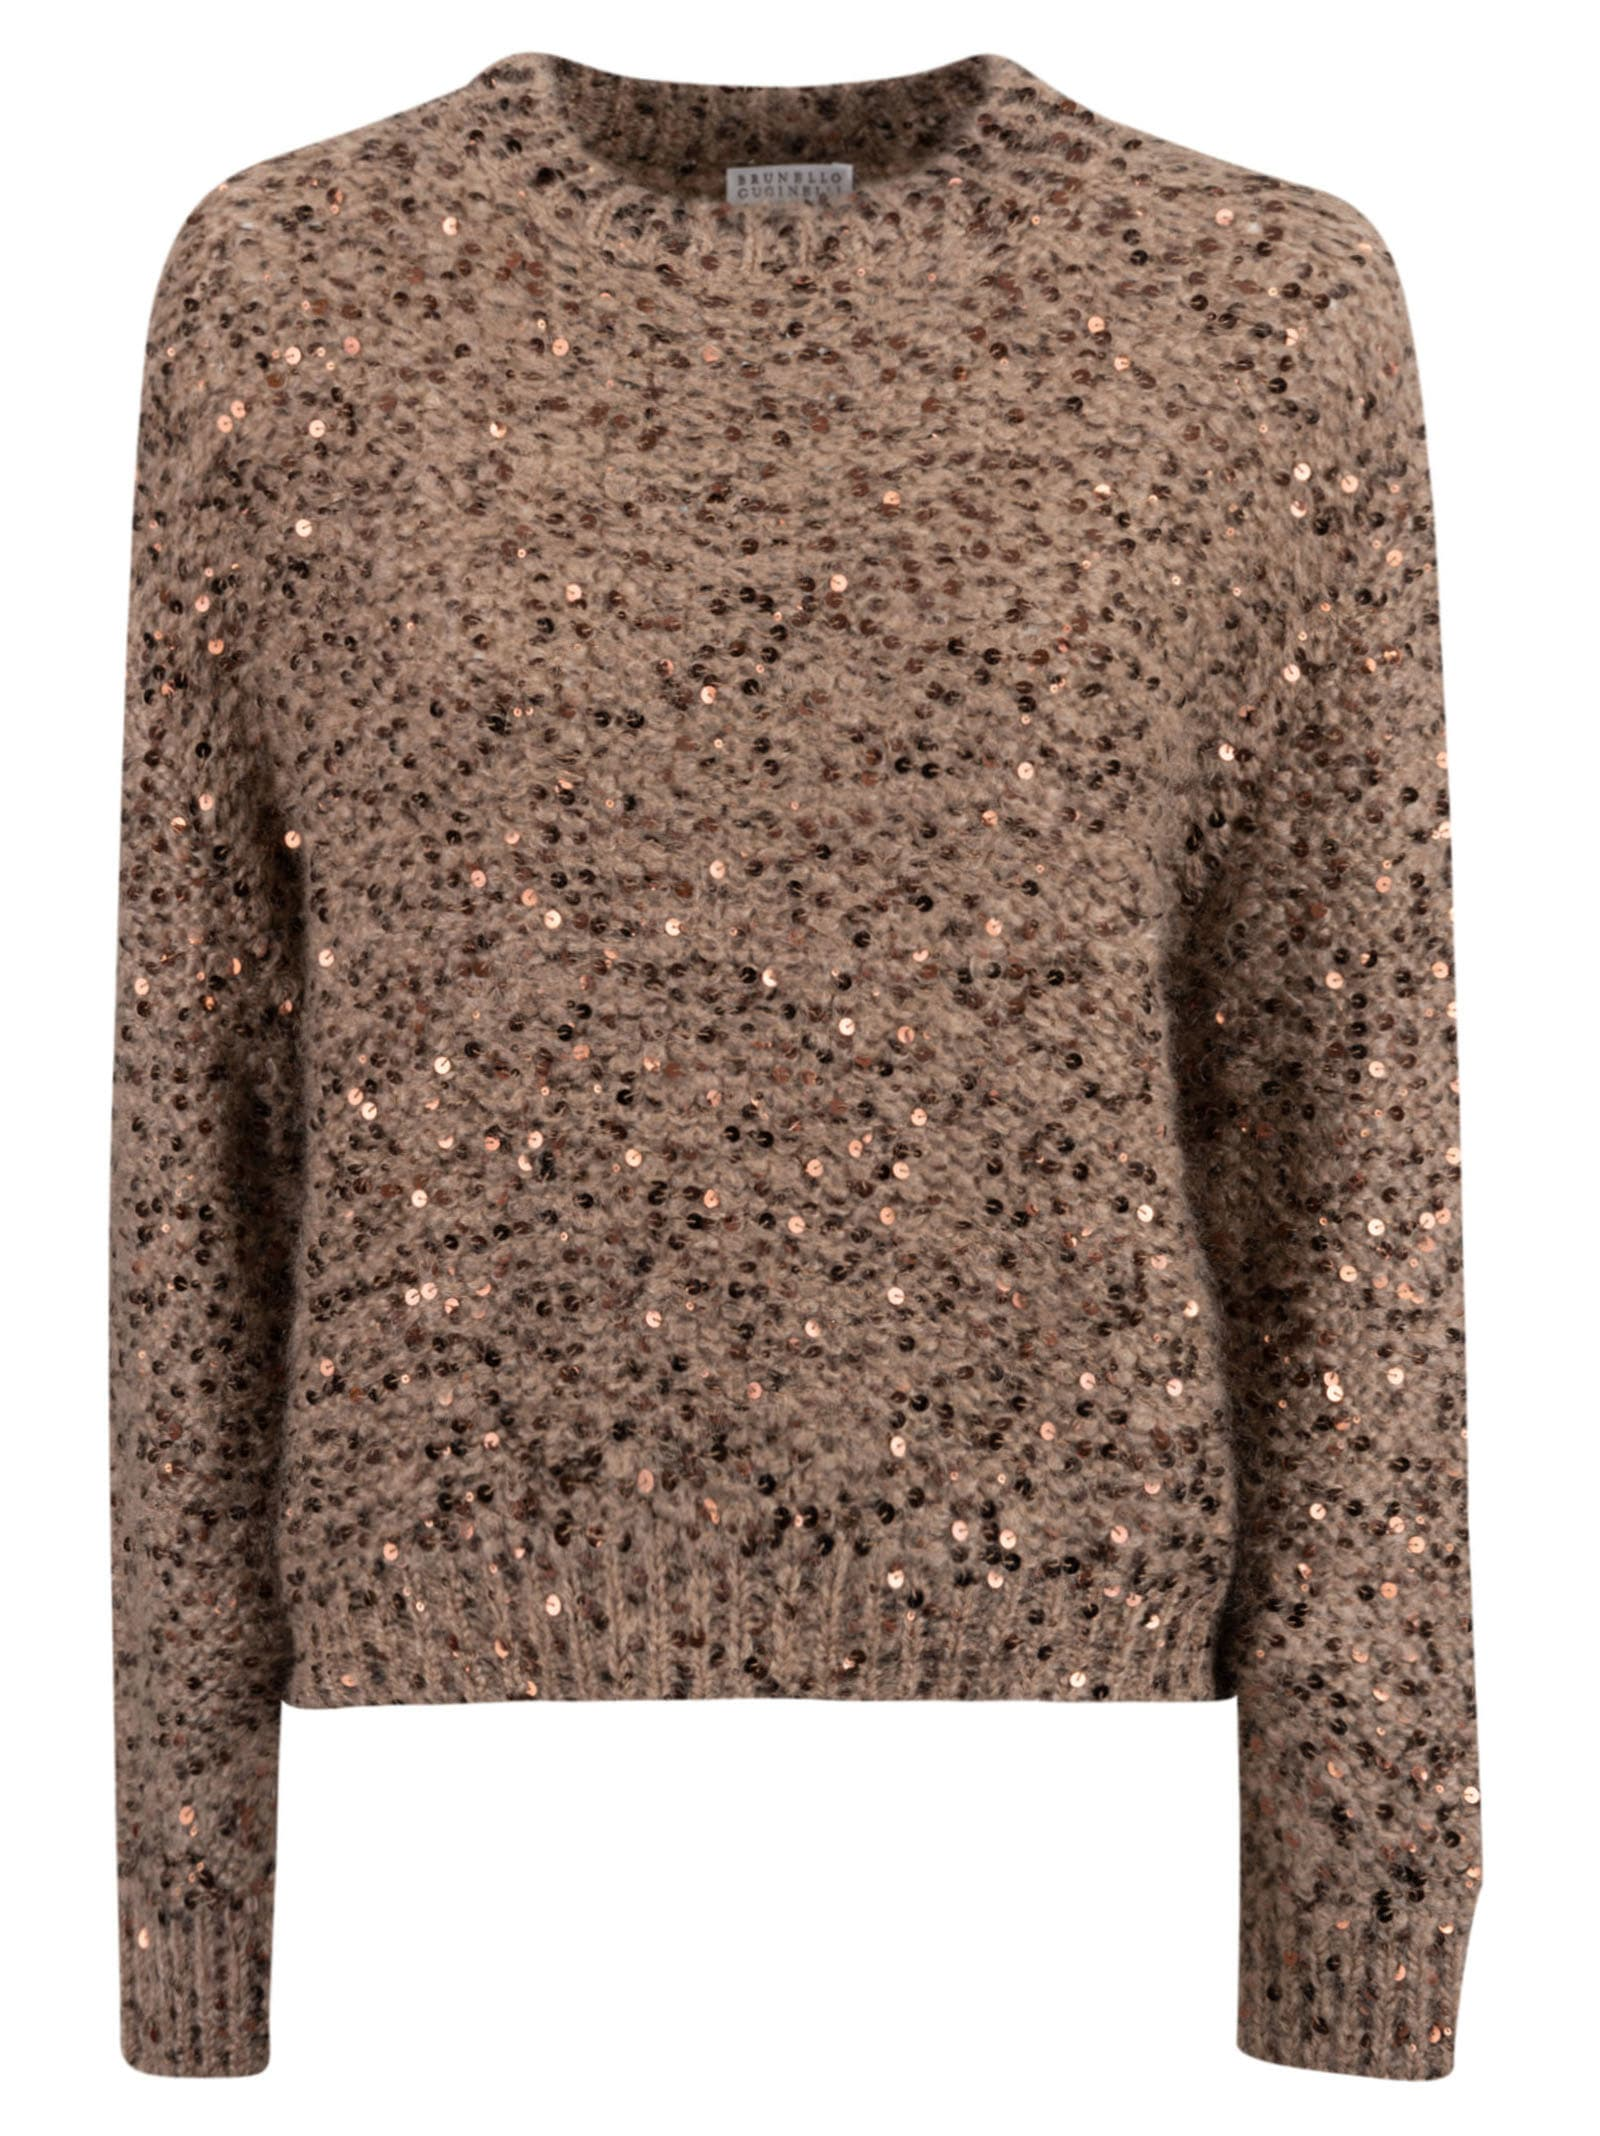 Brunello Cucinelli Bead Embellished Sweater